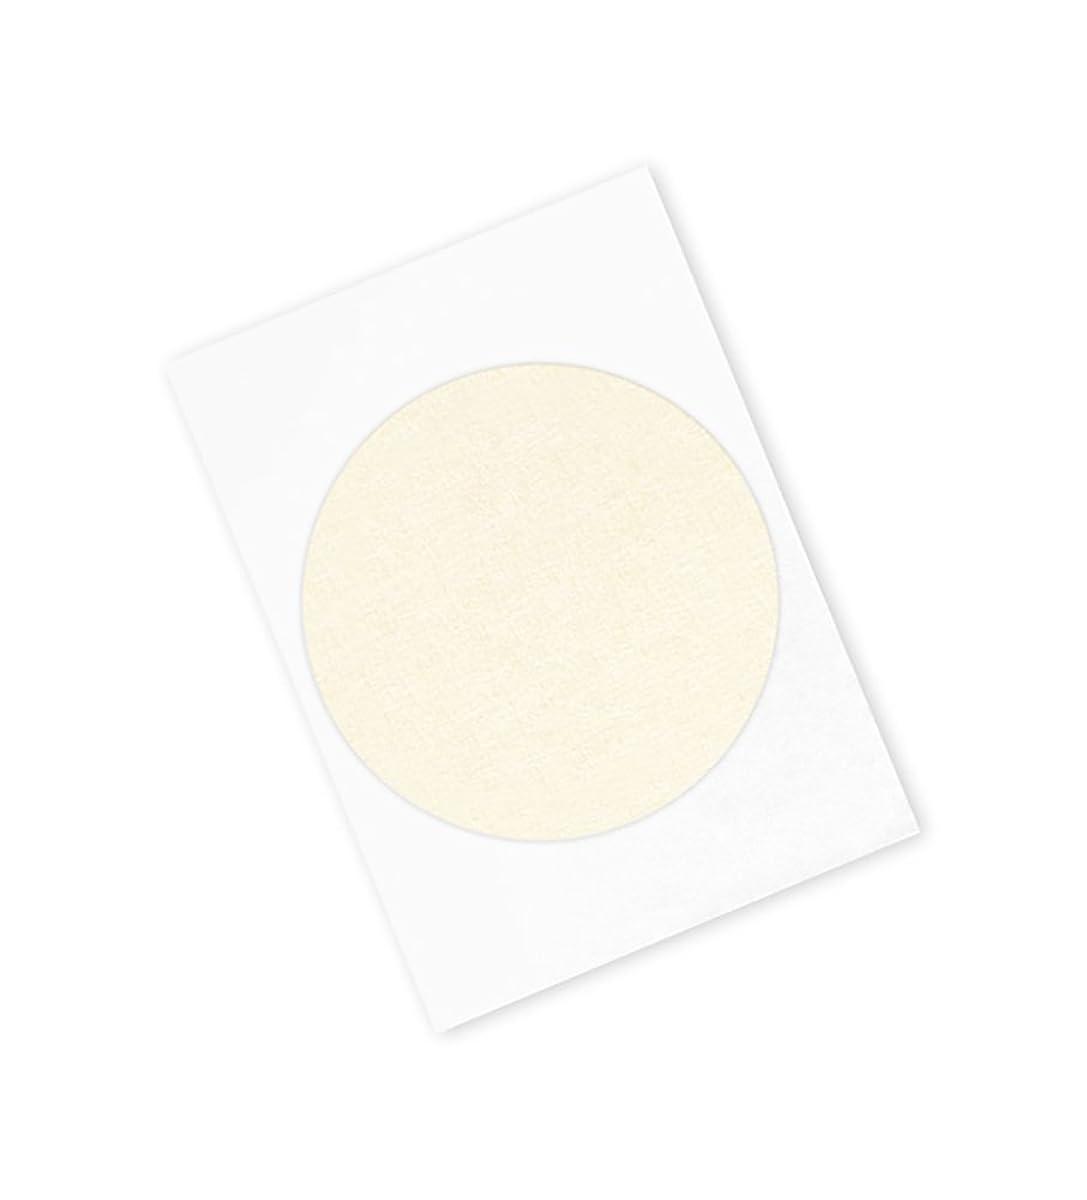 3M 2380 Performance Masking Tape, HD2380-1.938